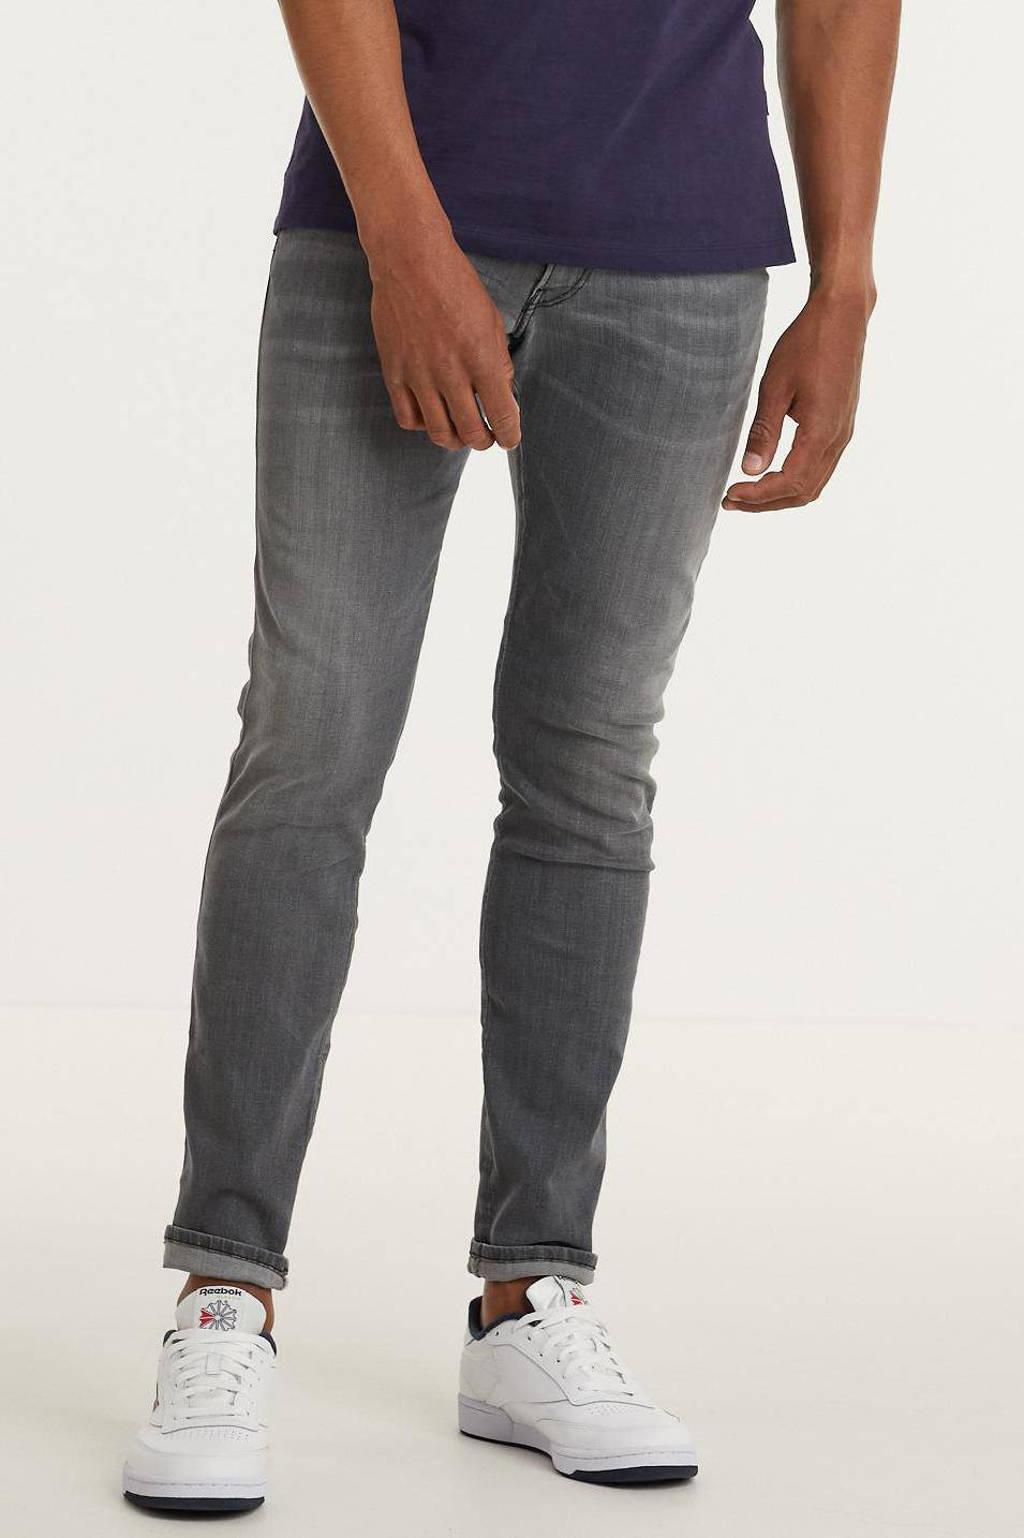 REPLAY slim fit jeans Anbass 096 - medium grey, 096 - MEDIUM GREY